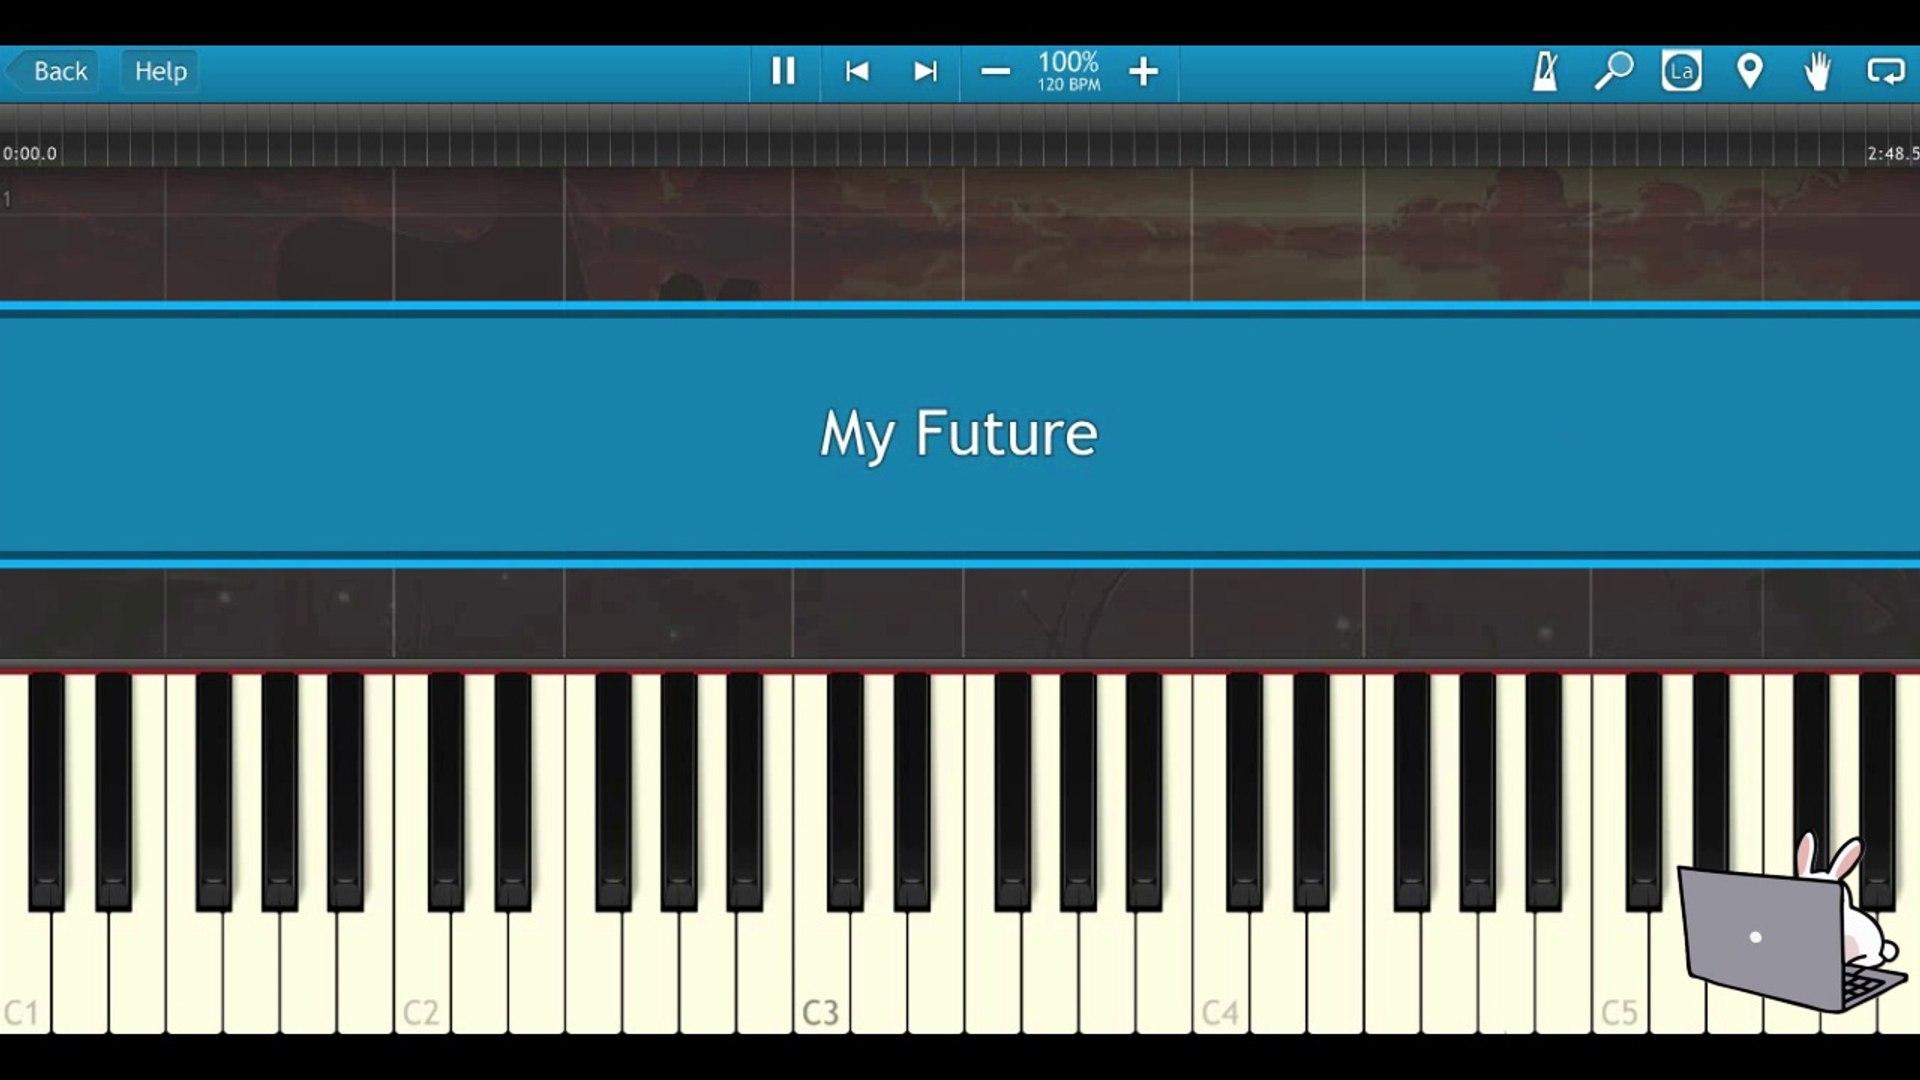 Billie Eilish - my future (Piano Tutorial Synthesia)